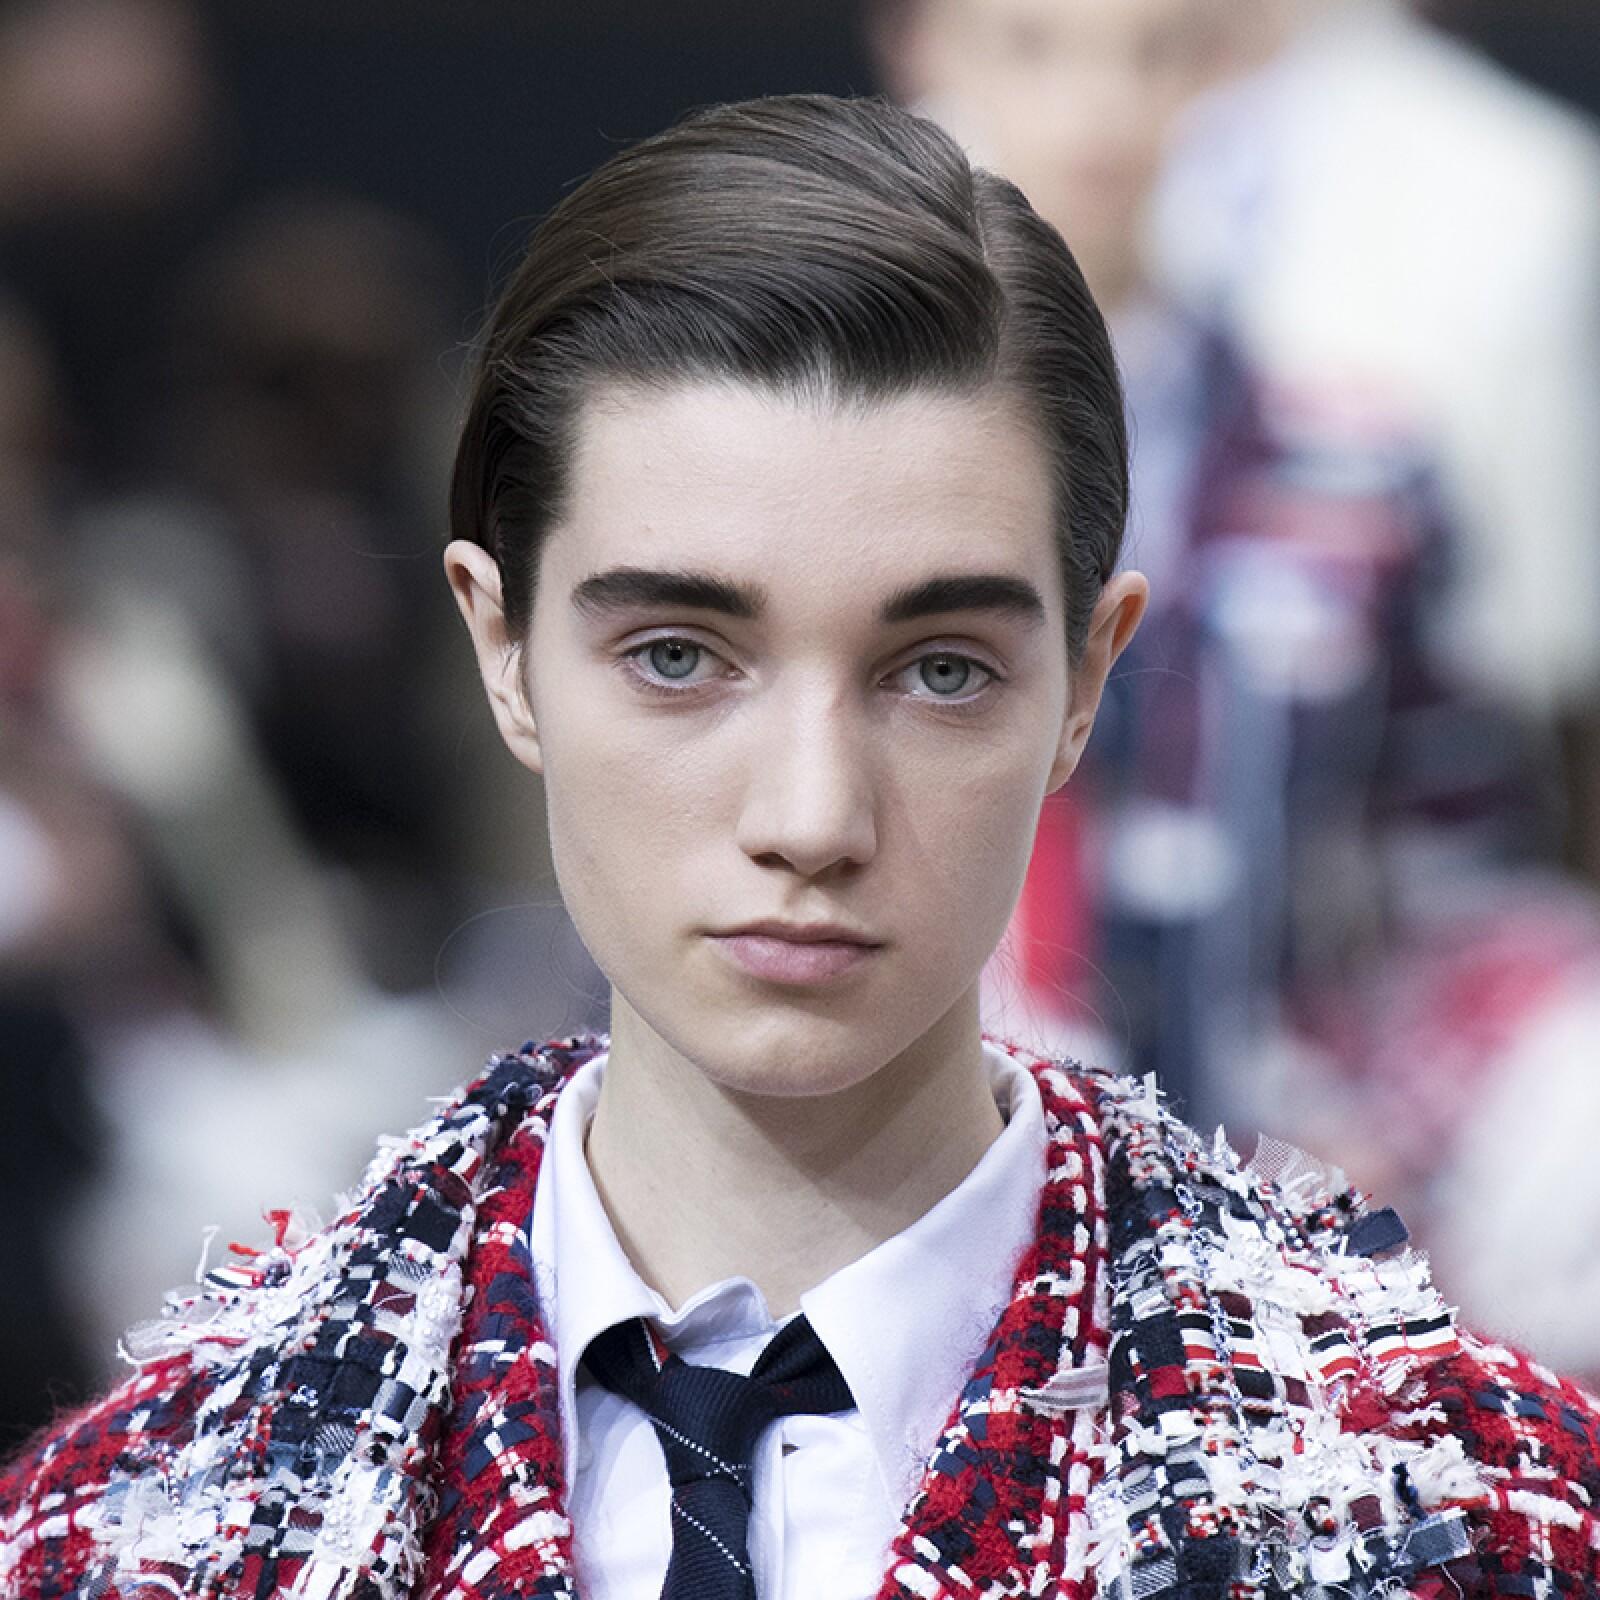 PFW-Paris-Fashion-Week-Runway-Pasarela-Beauty-Look-Belleza-Thome-Browne